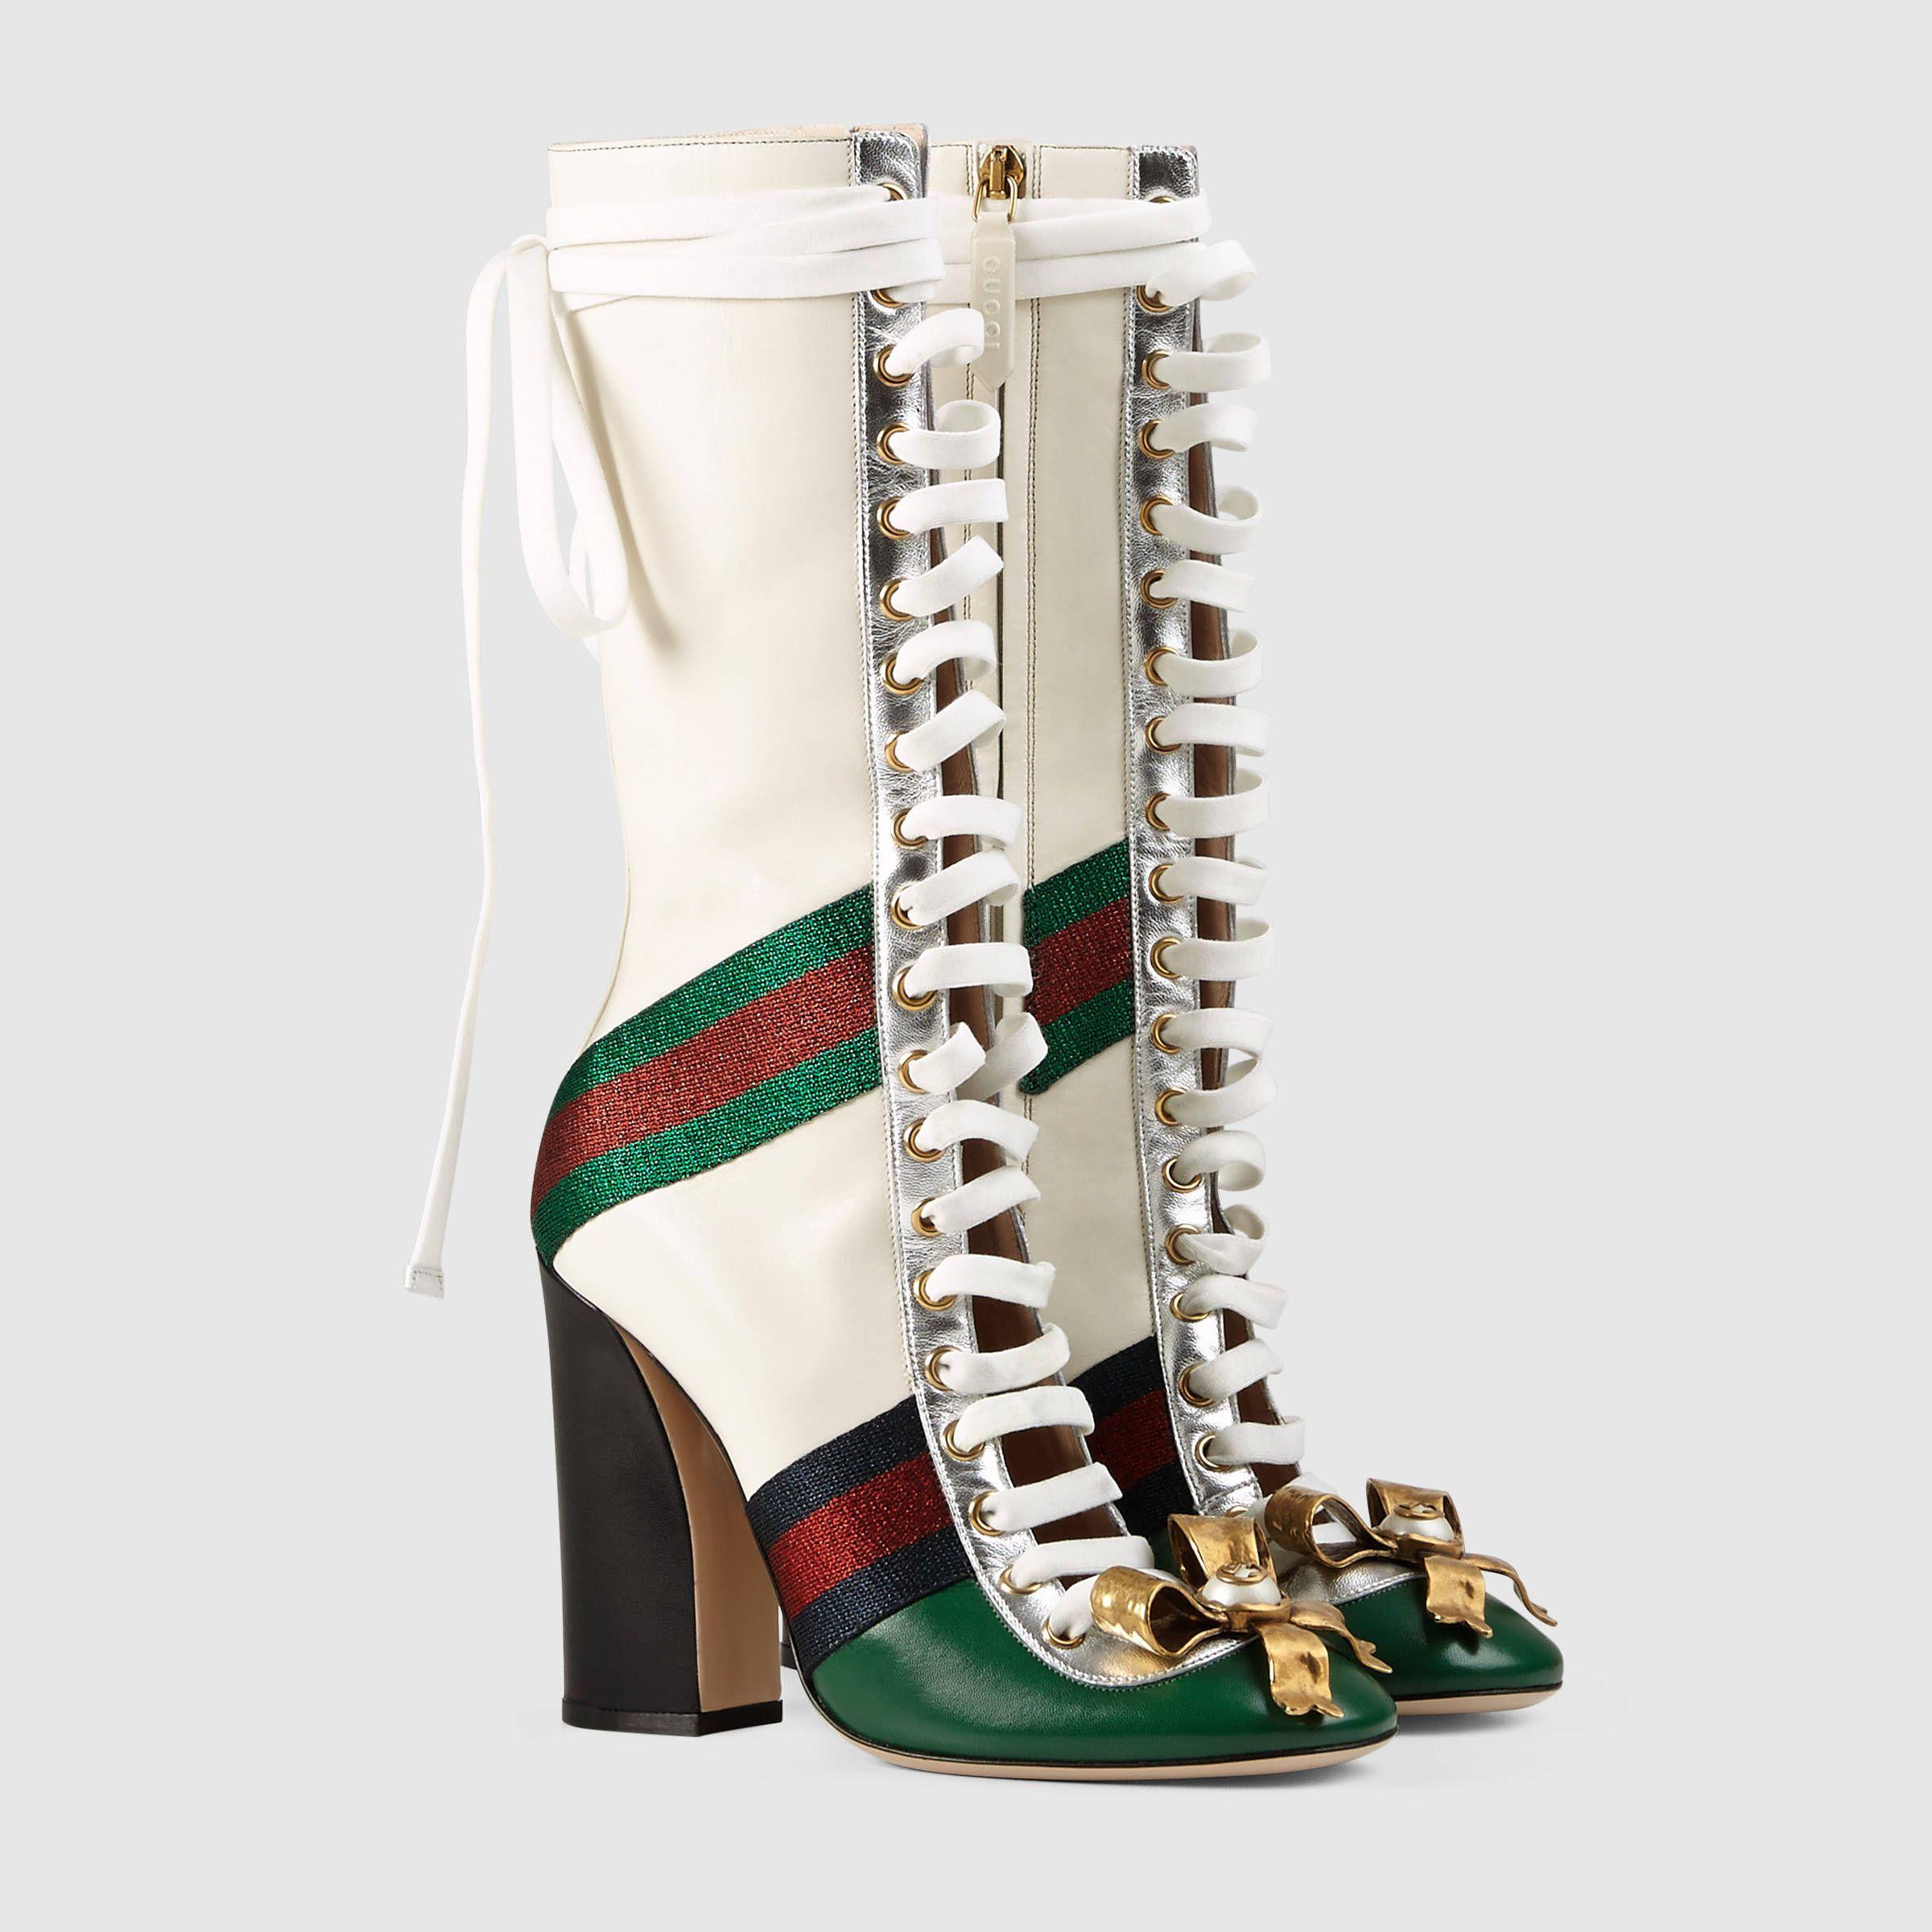 8a889648936e Gucci Women - Finnlay leather high boot - 421942CQXK03175